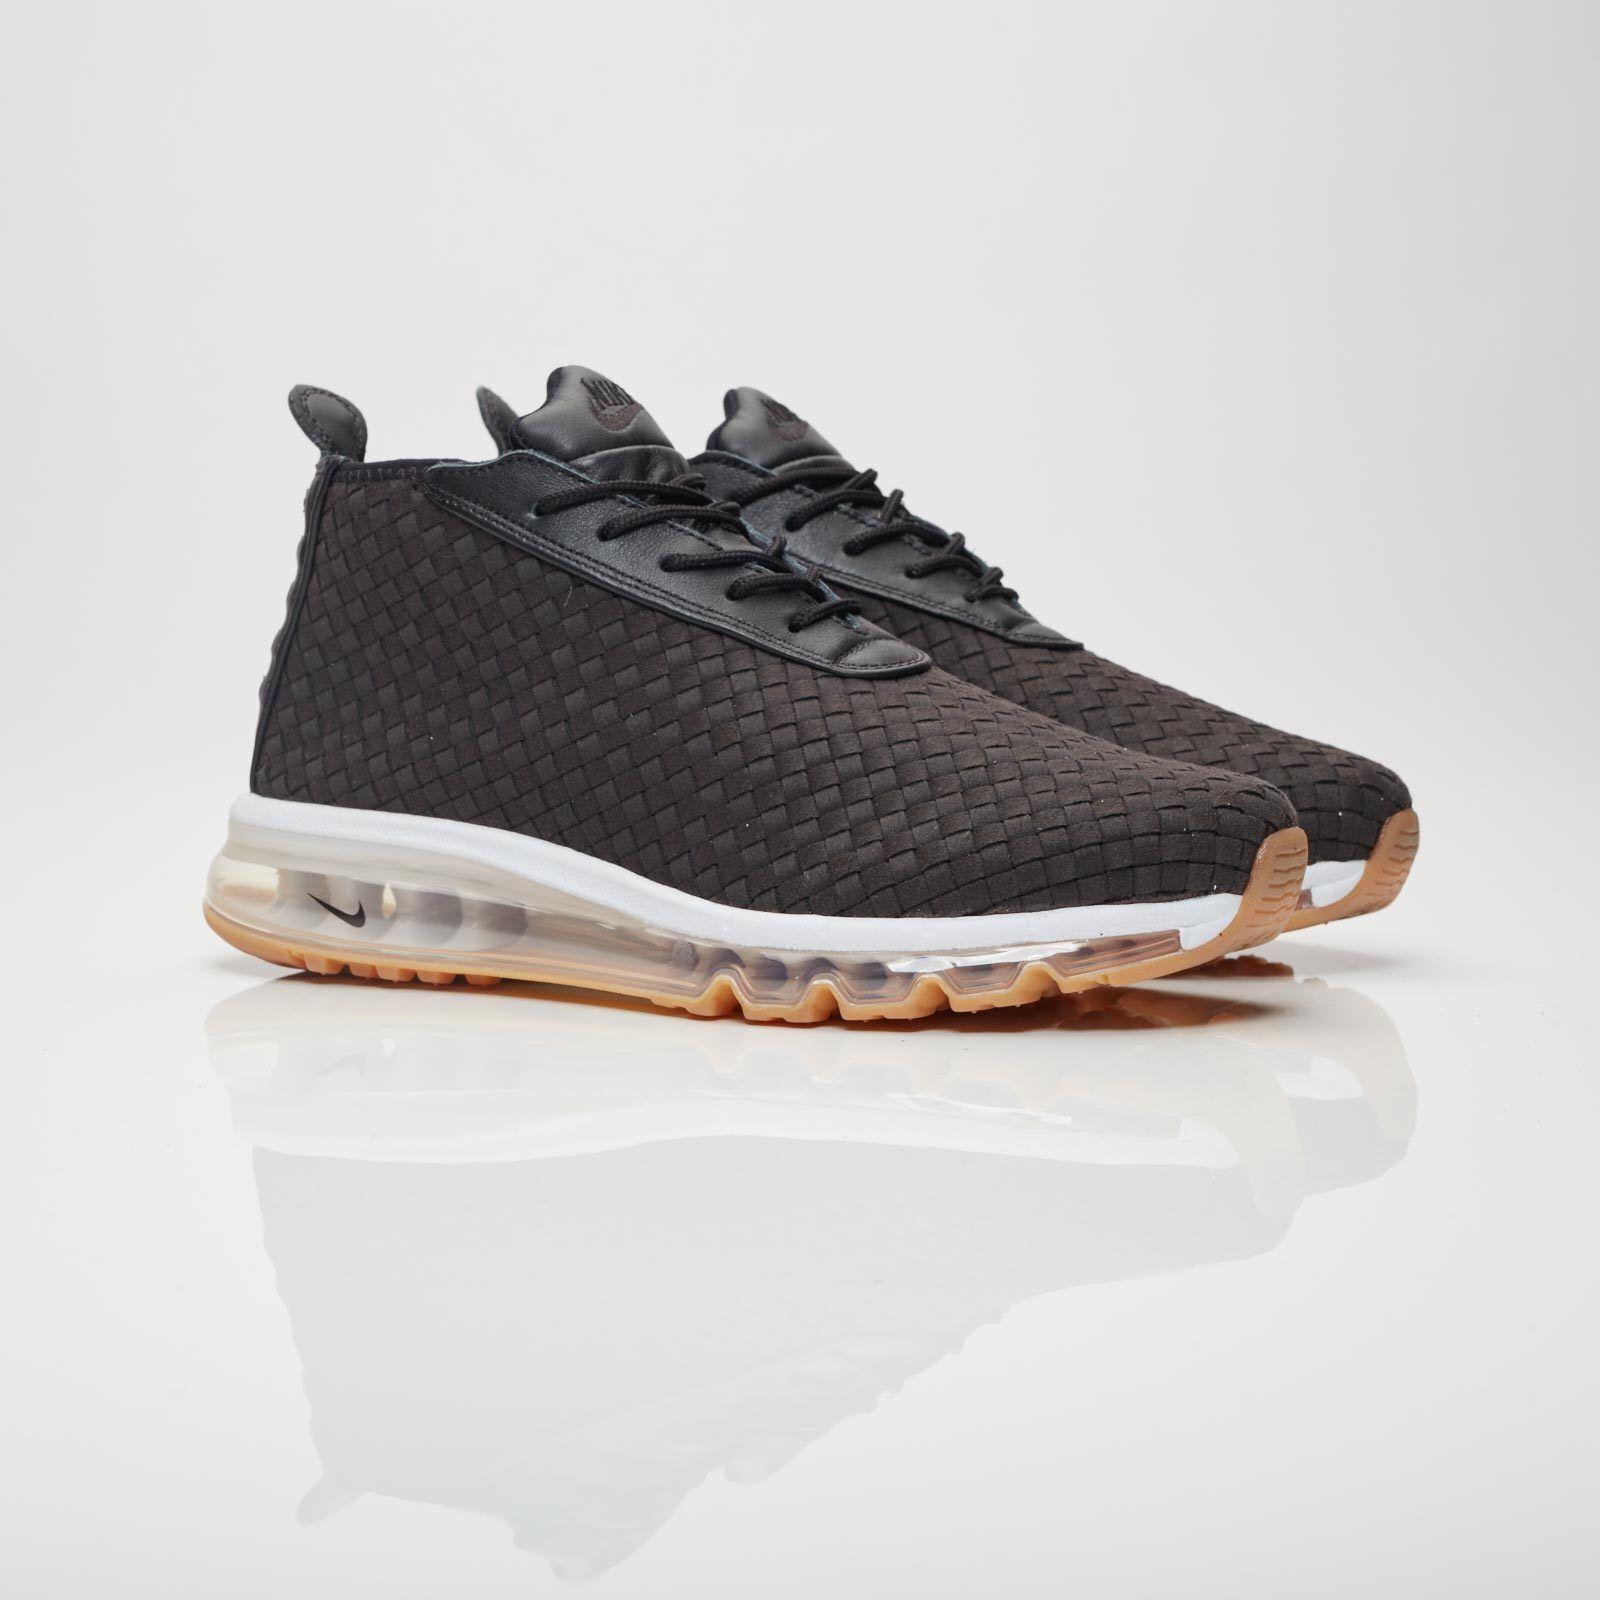 BNIB Men's Nike Air Max Woven Boot  % Authentics 921854 003